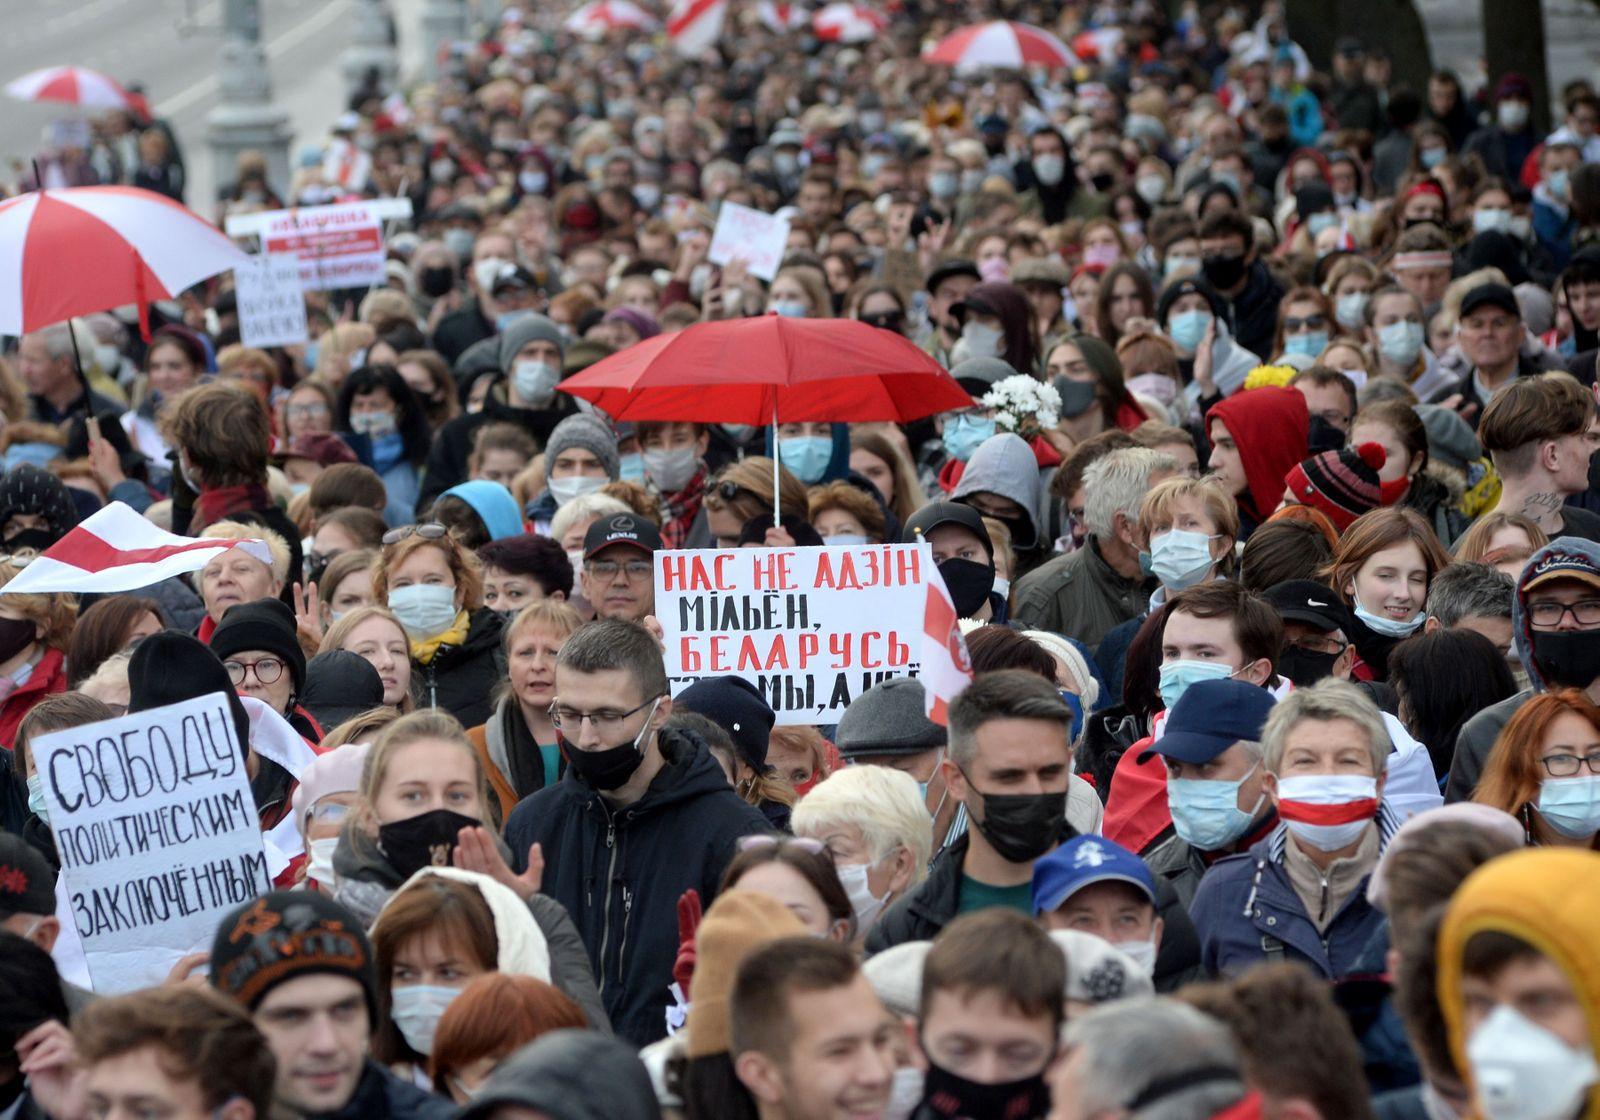 Pensioners protest in Minsk, Belarus - 26 Oct 2020